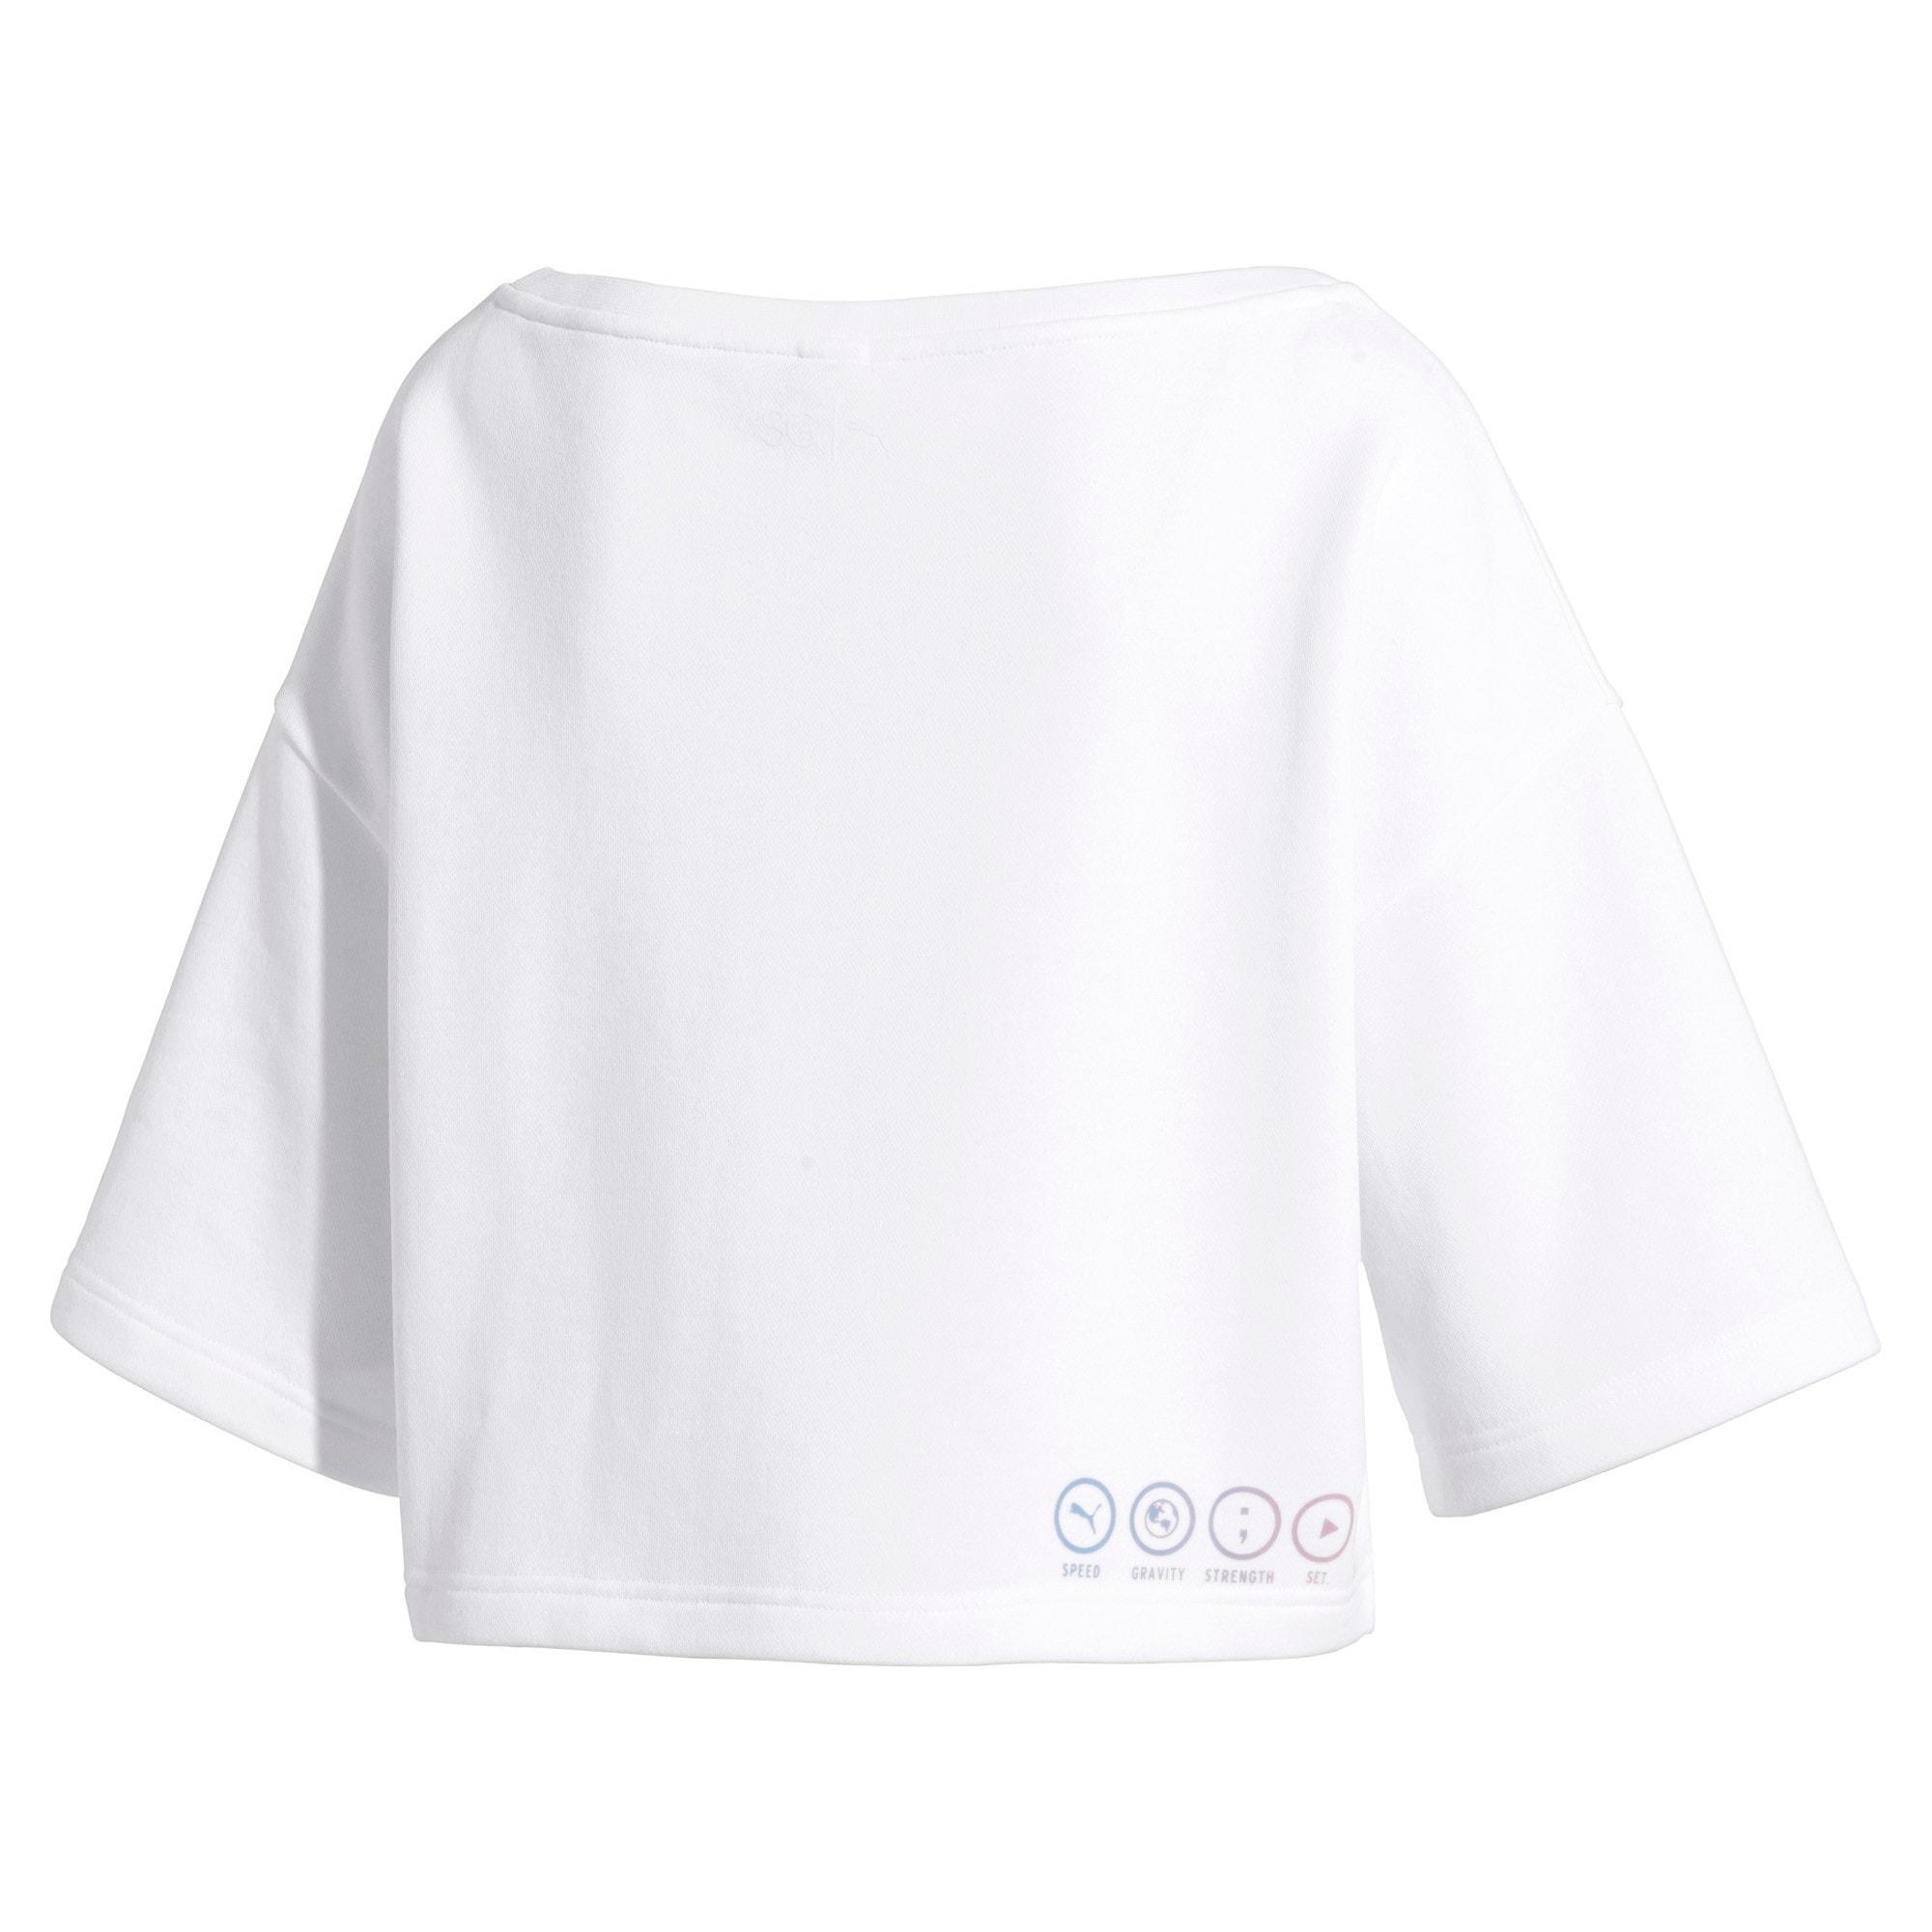 Thumbnail 5 of PUMA x SELENA GOMEZ Cropped Short Sleeve Women's Sweater, Puma White, medium